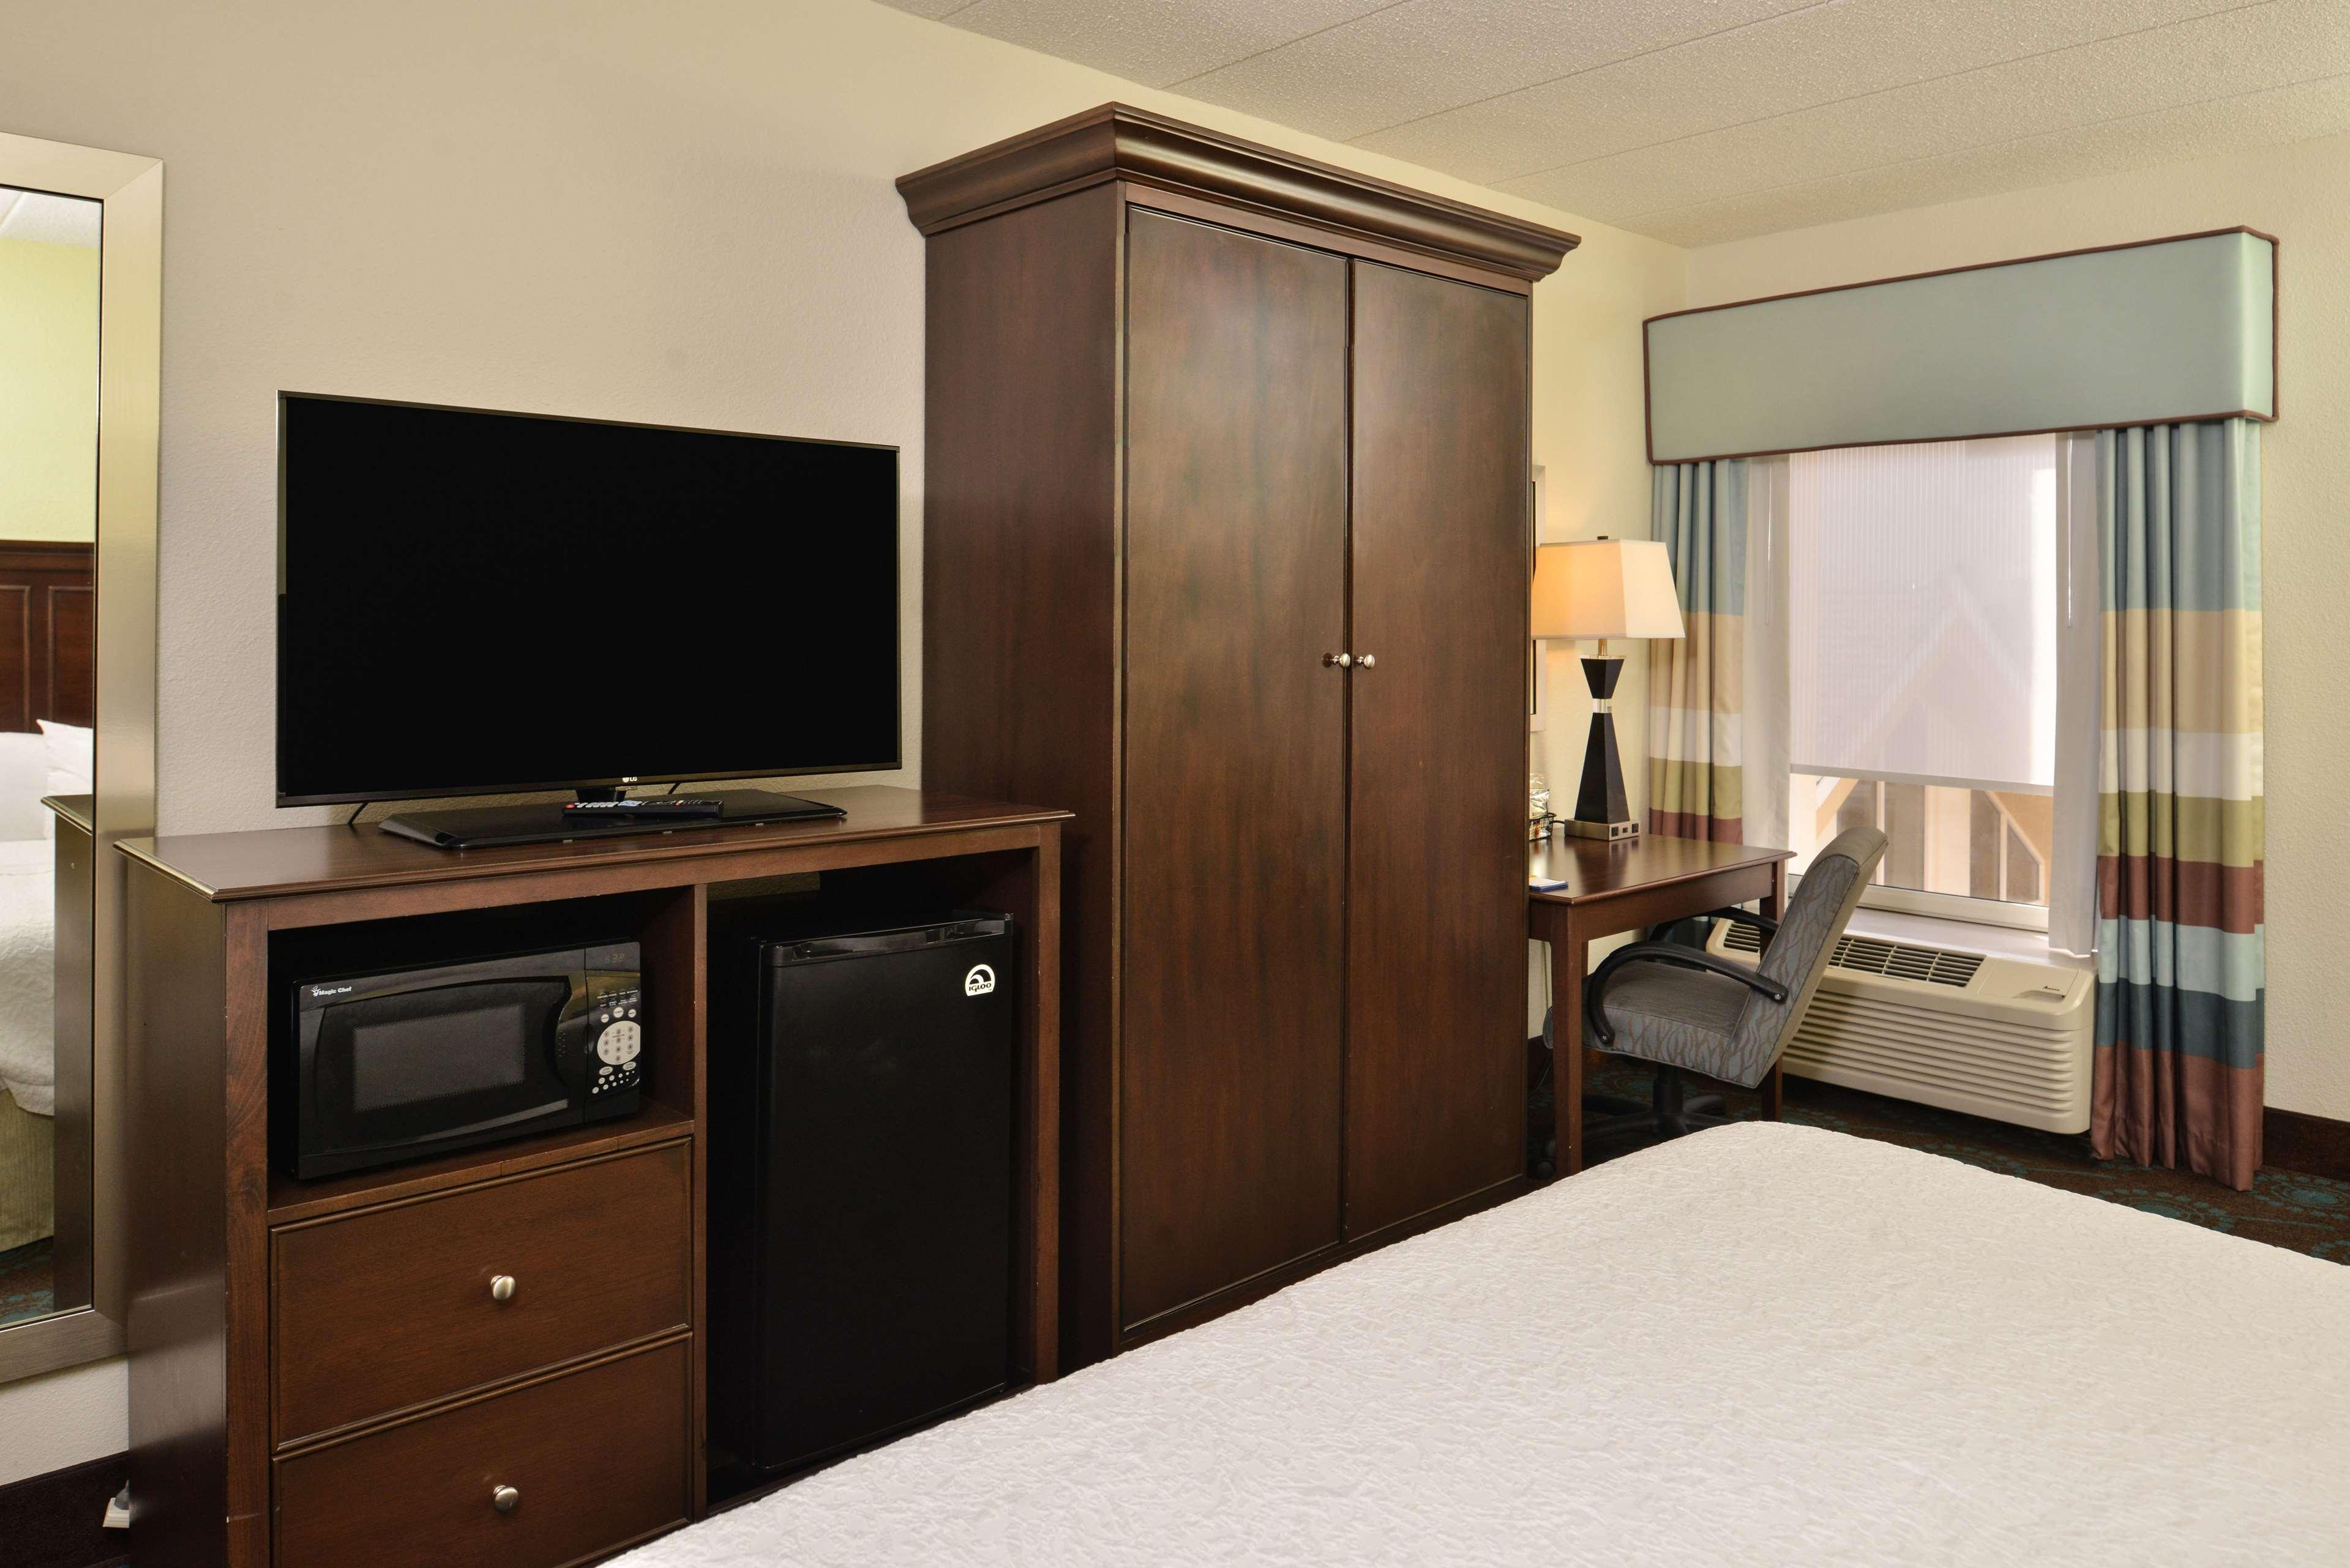 Hampton Inn & Suites Newport News (Oyster Point) image 36